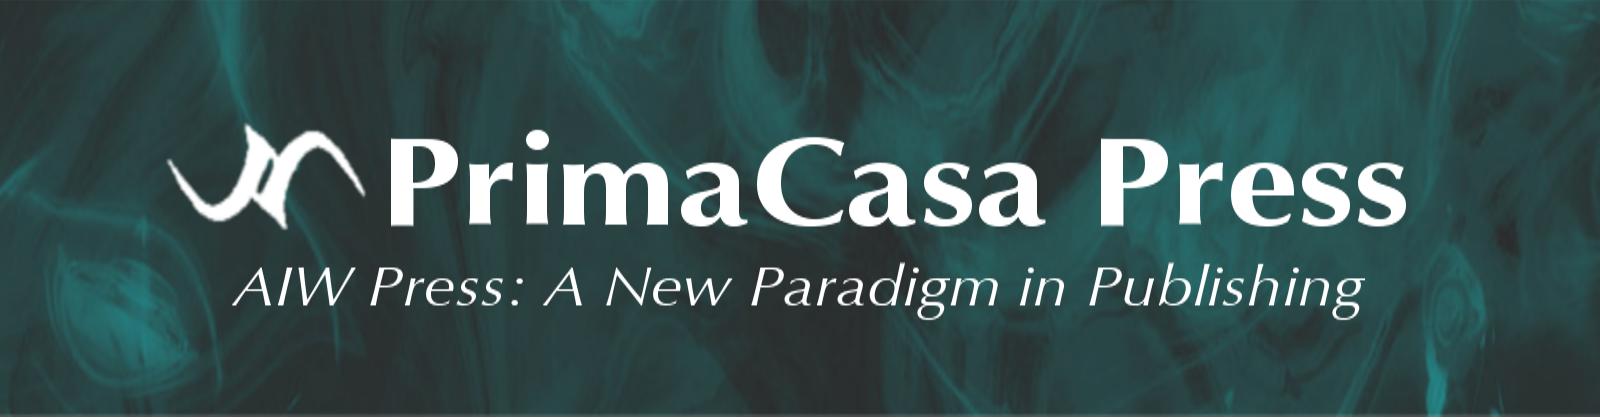 PrimaCasa Press